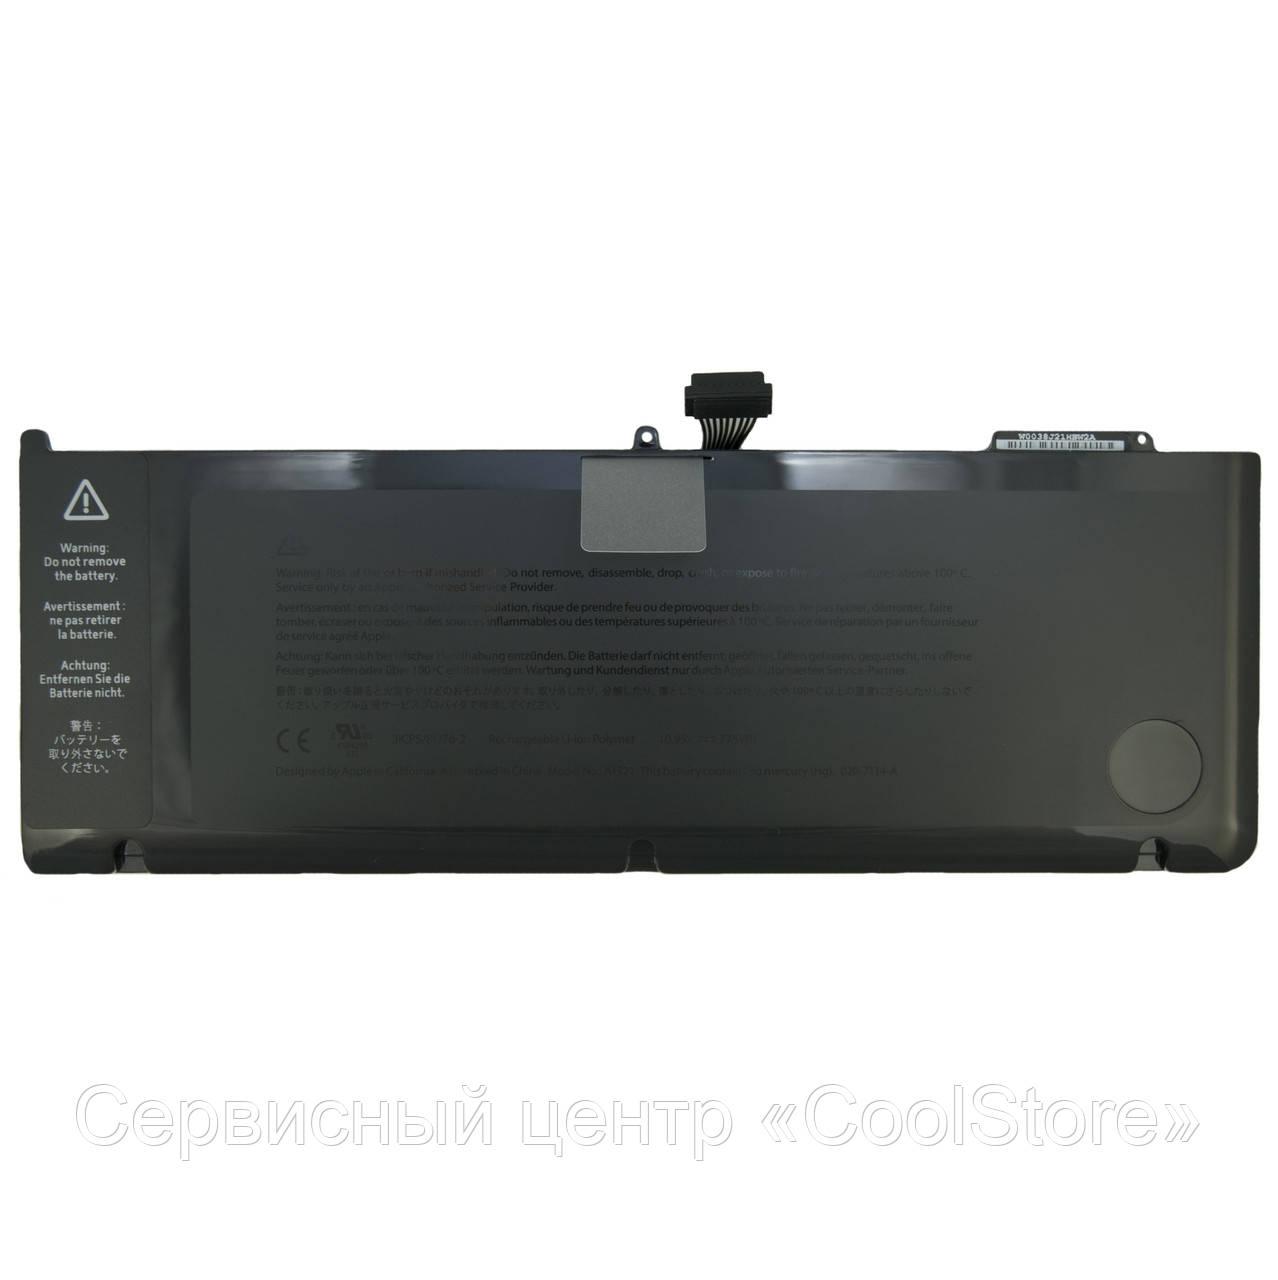 "Батарея A1321 для MacBook Pro 15"" 2009-2010гг. A1286"